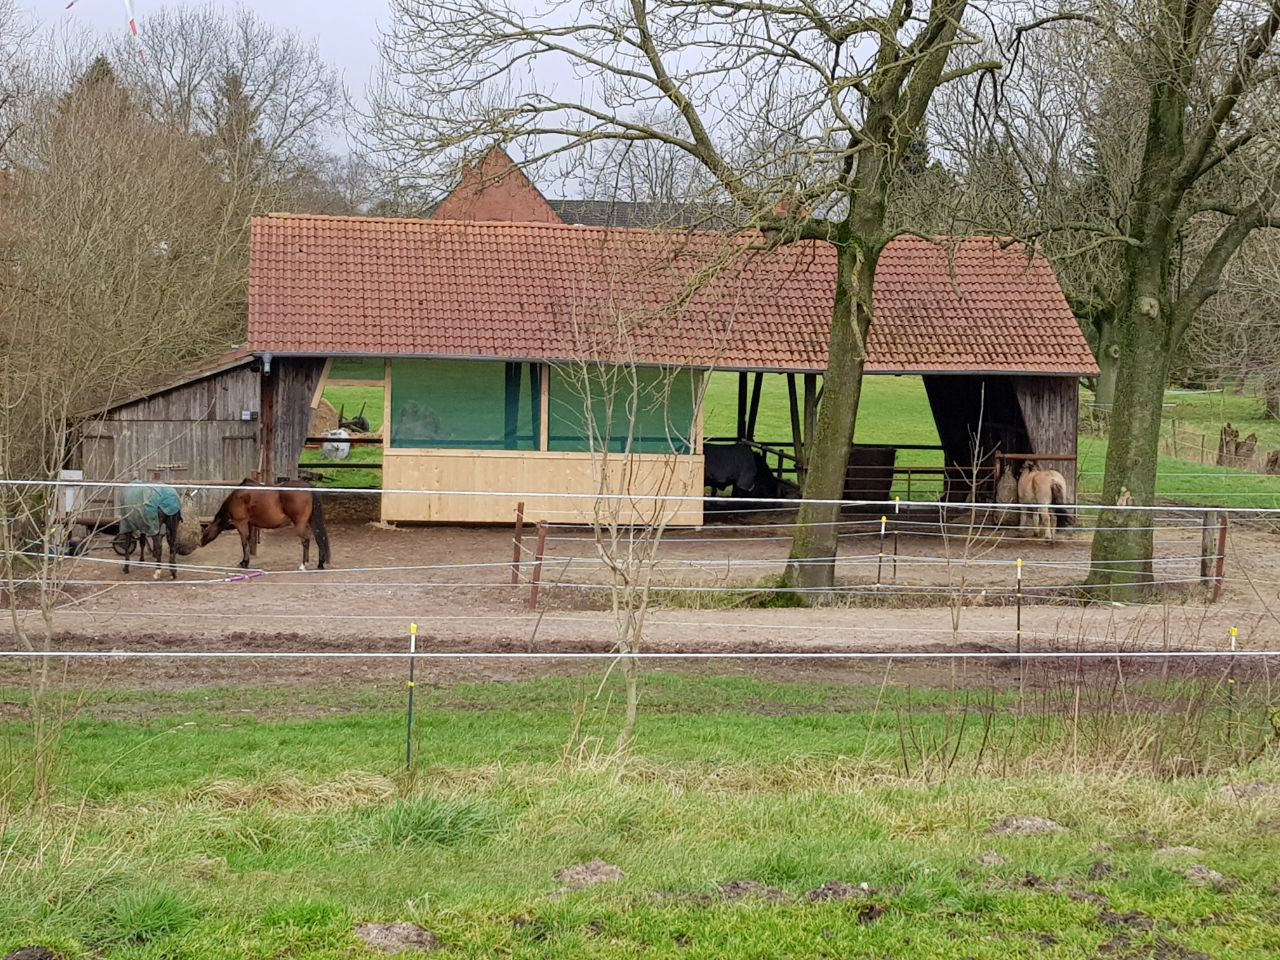 offenstall am seehauser groden wolpmanns hof die pferdepension in seehausen. Black Bedroom Furniture Sets. Home Design Ideas